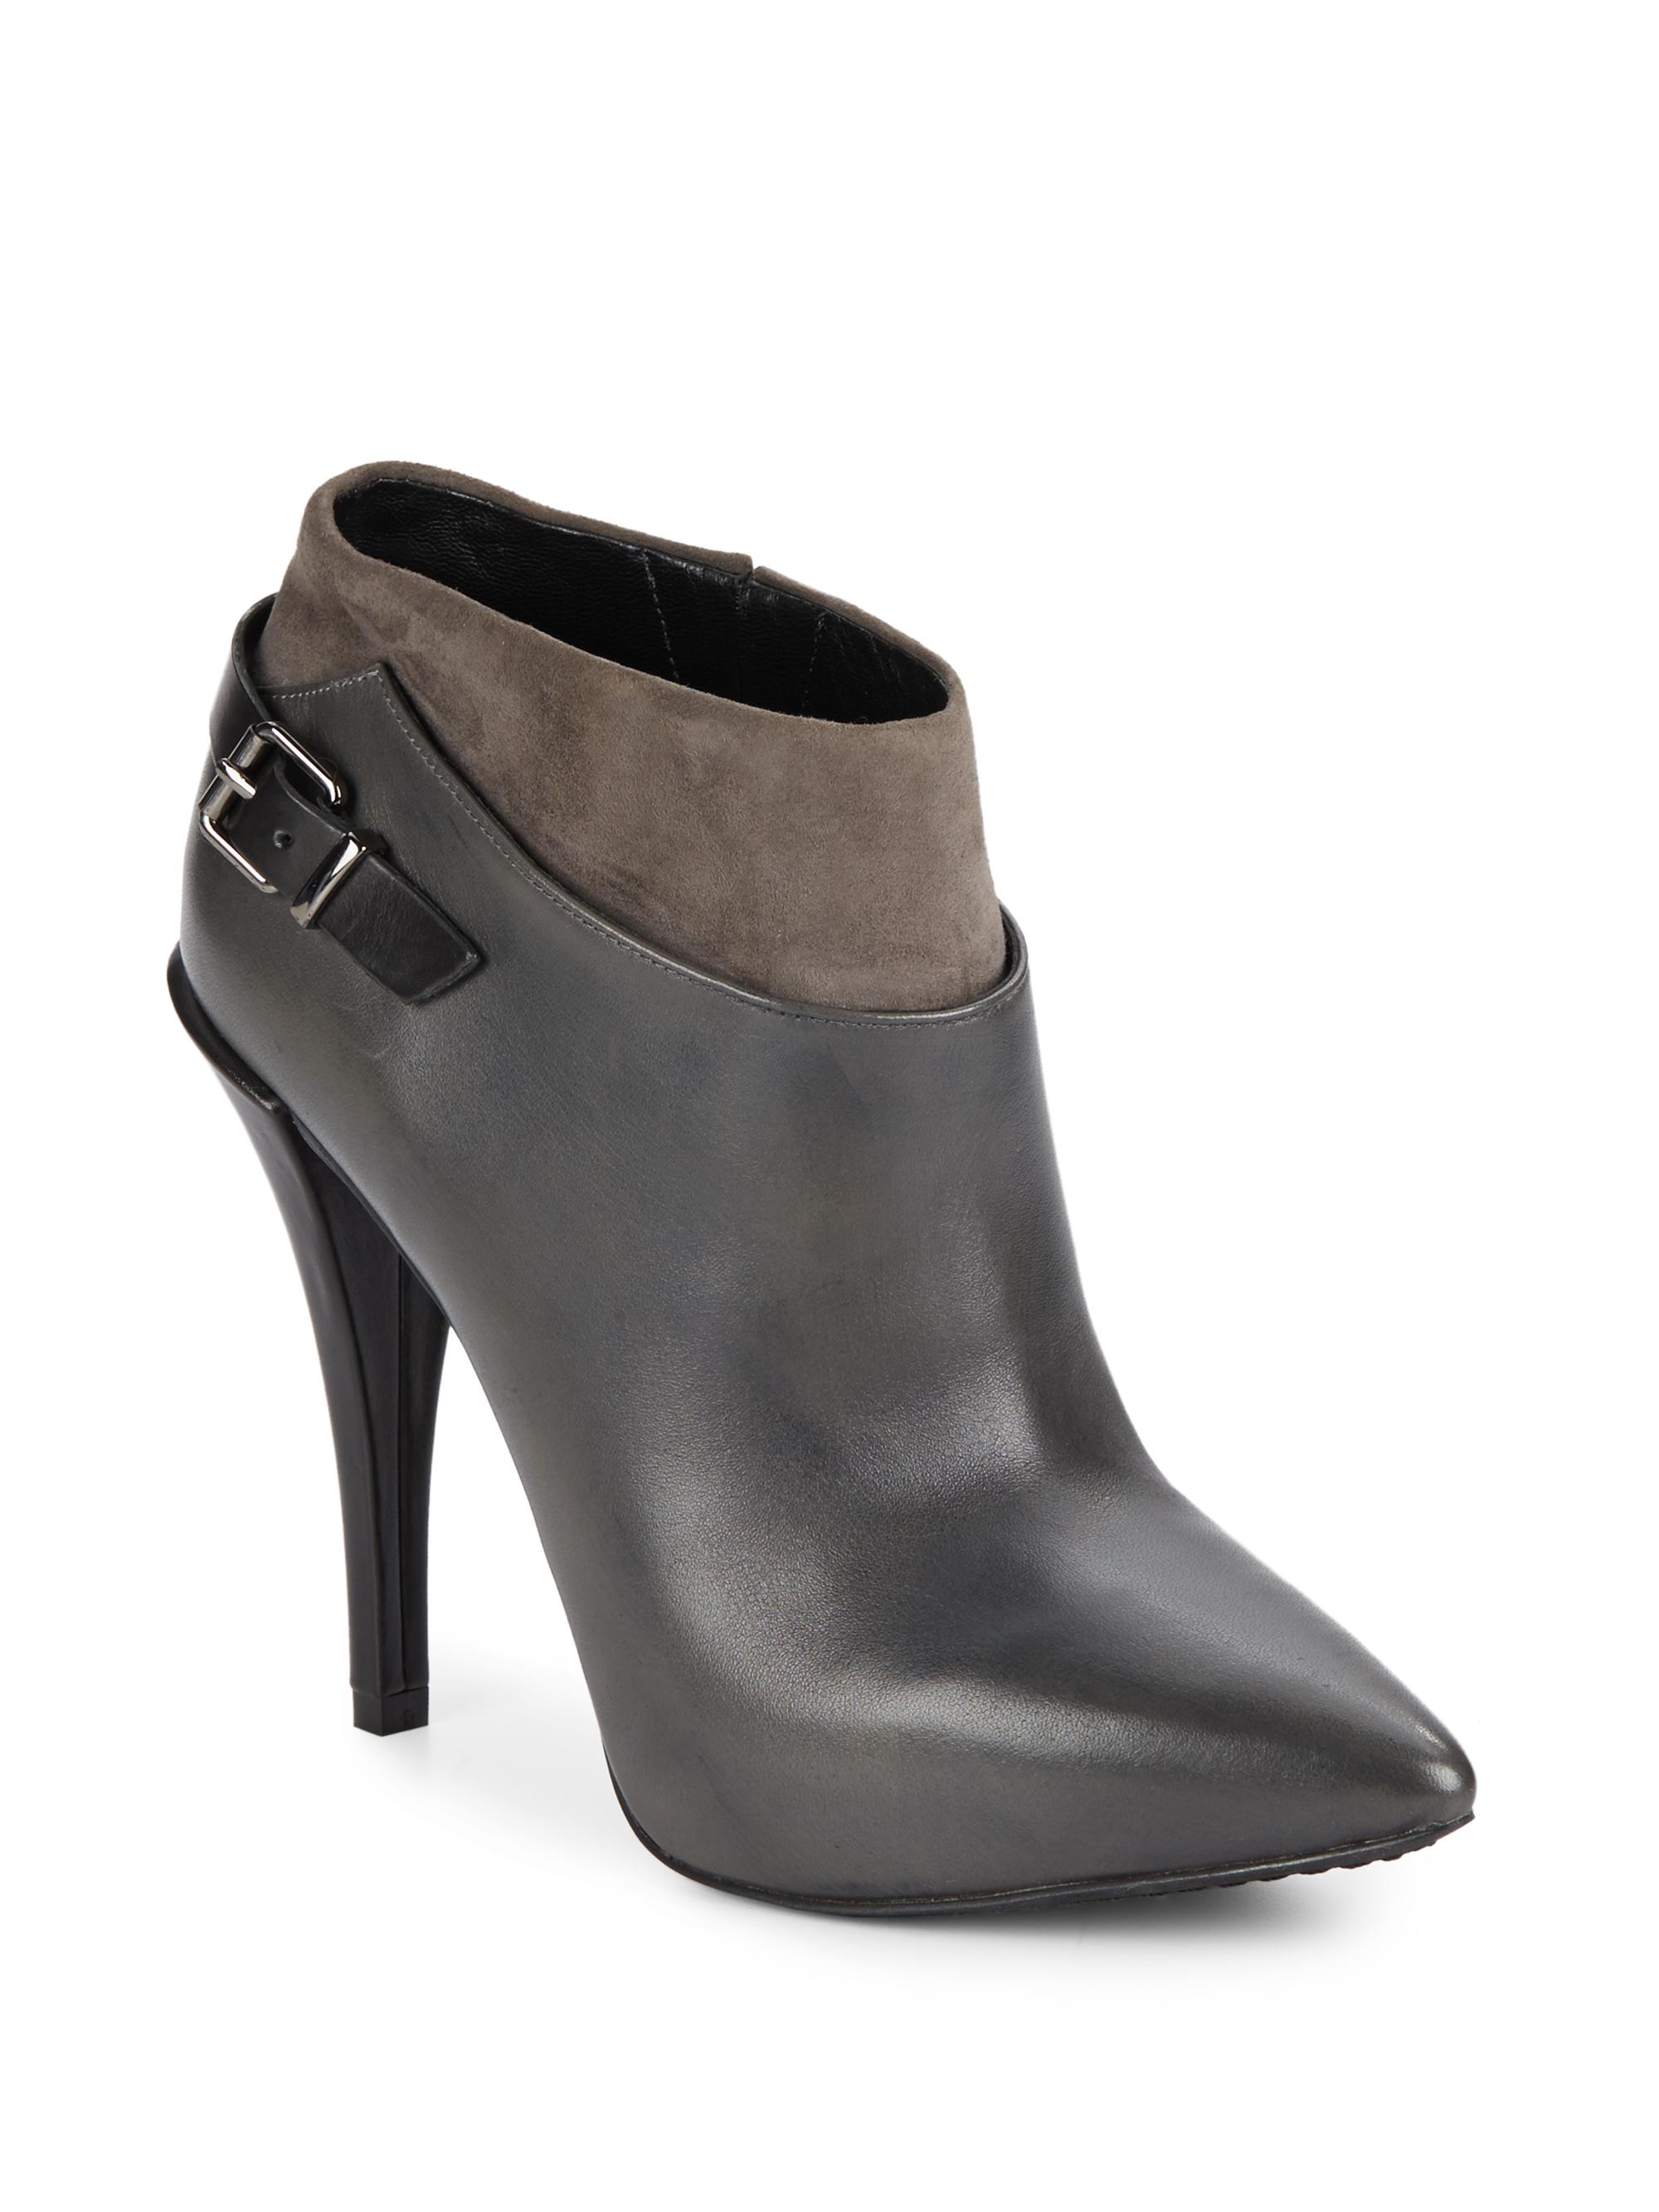 Shoes-019.JPG